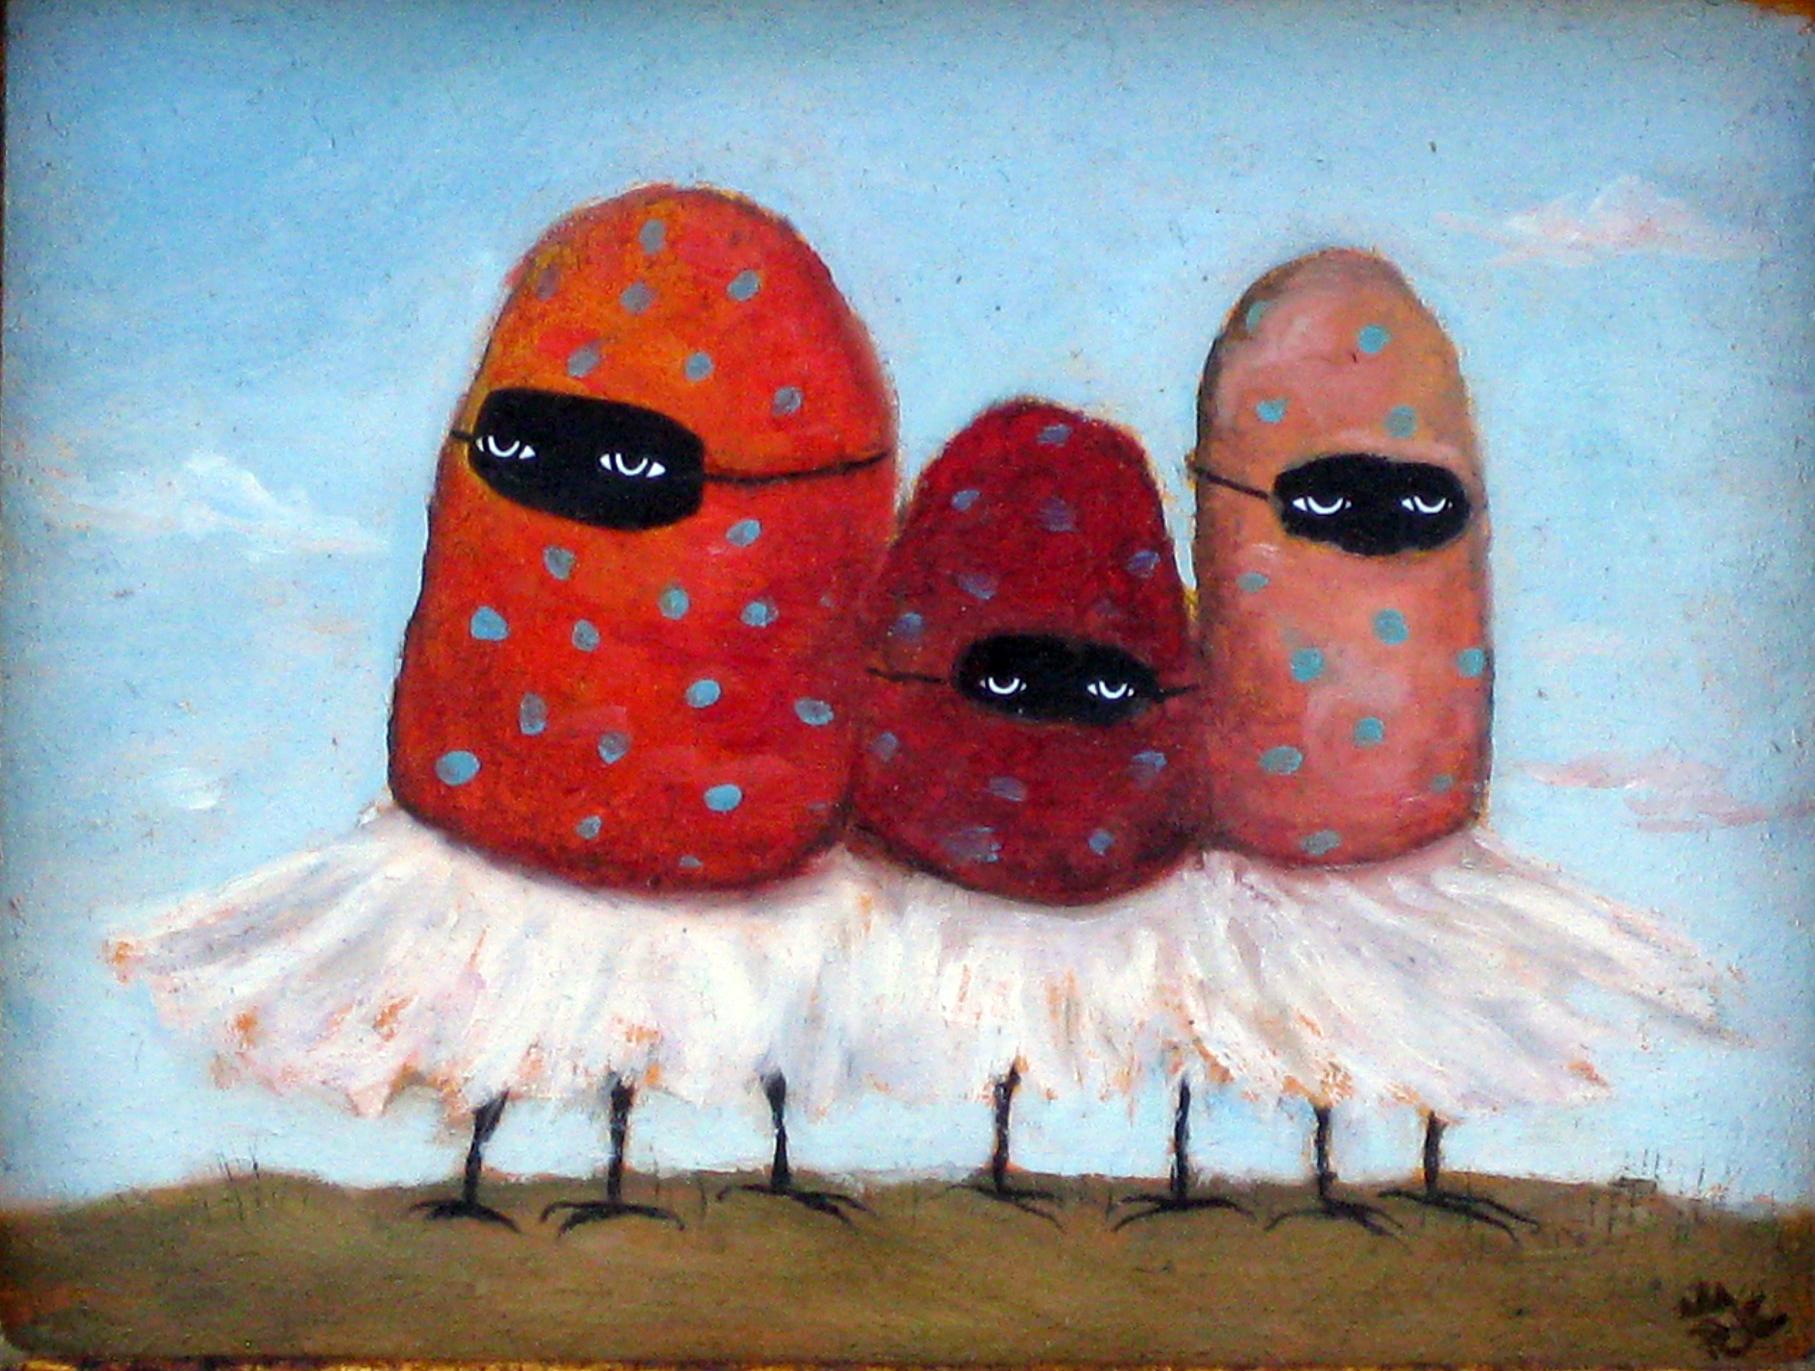 The Strawberry Ballerina Bandits